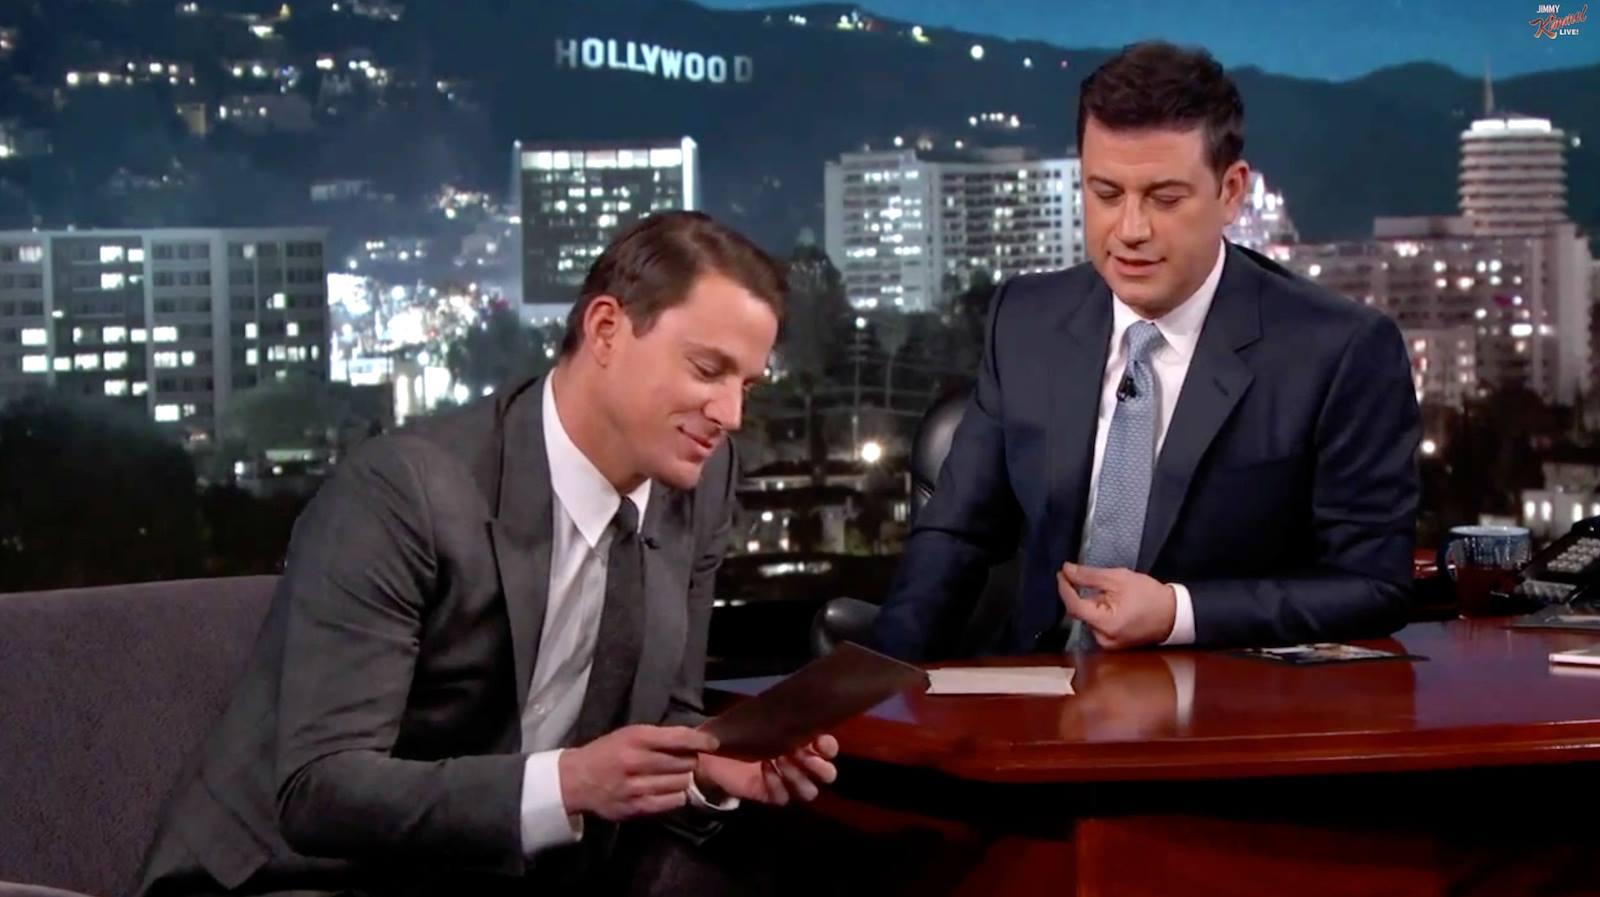 Channing Tatum Jimmy Kimmel Live